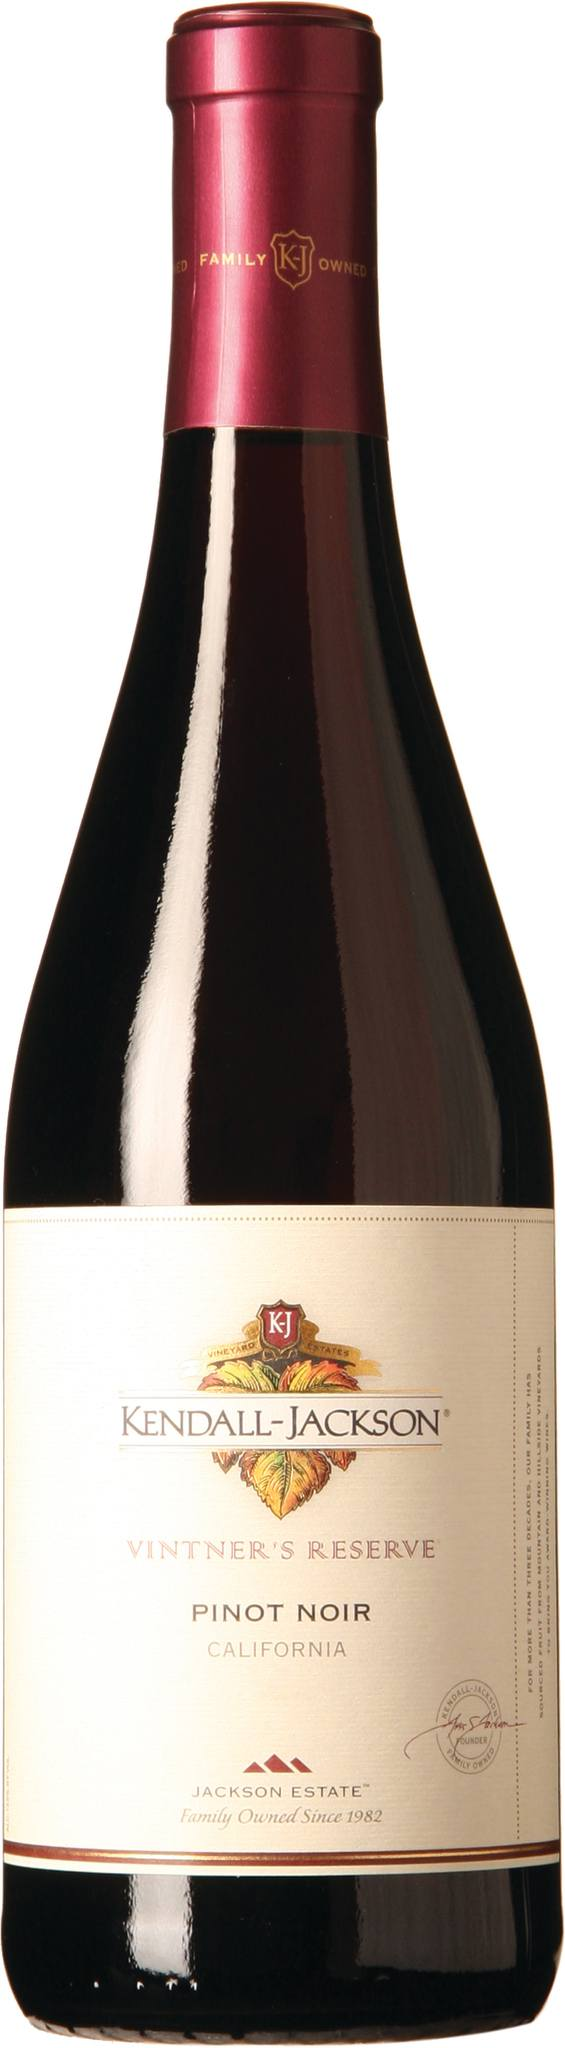 Kendall-Jackson Vintners Reserve Pinot Noir 2019